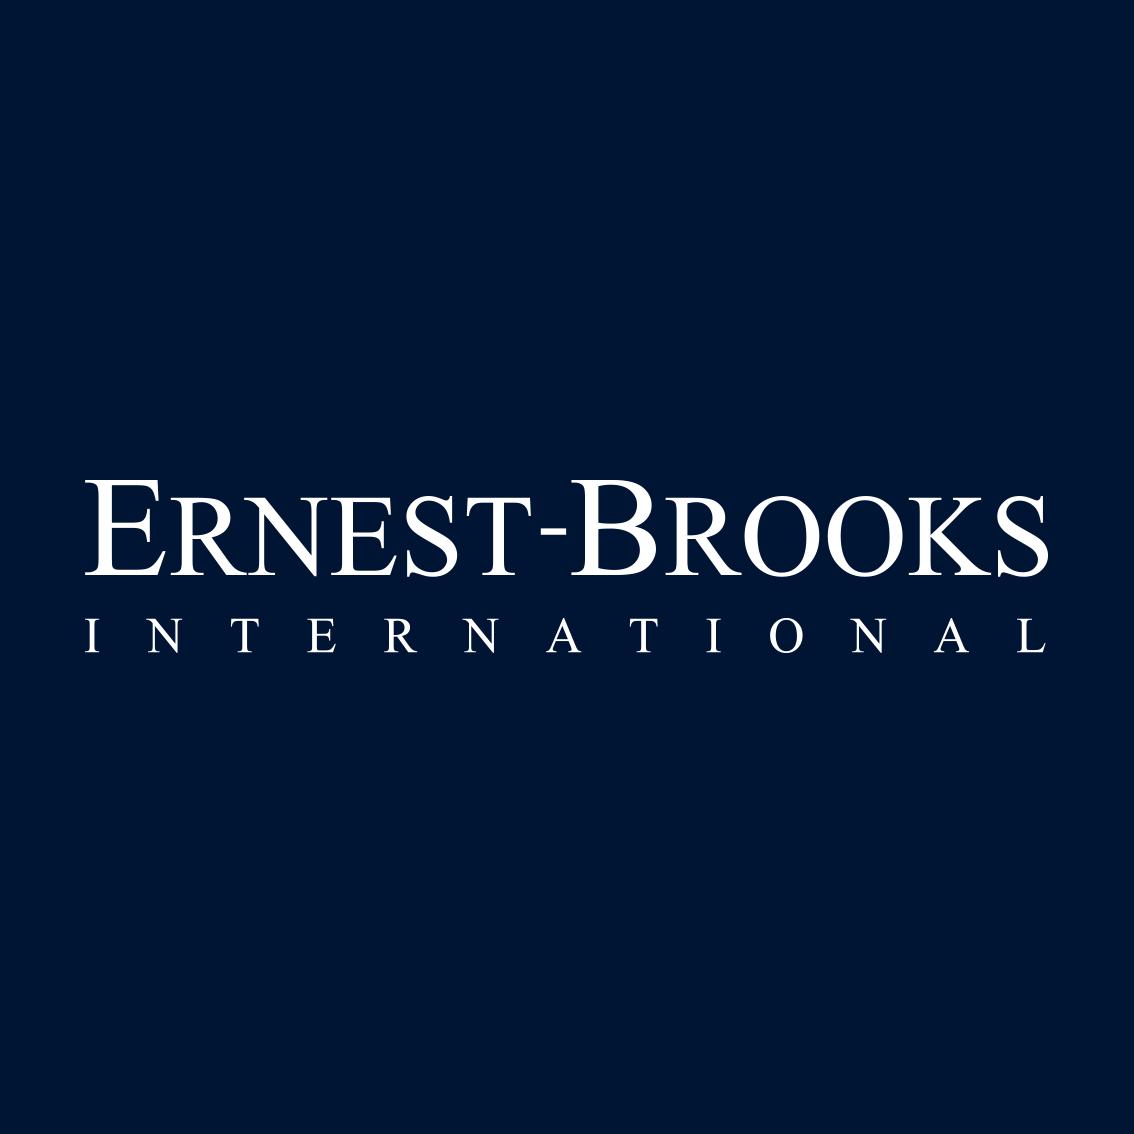 Ernest-Brooks International - Marsh Wall